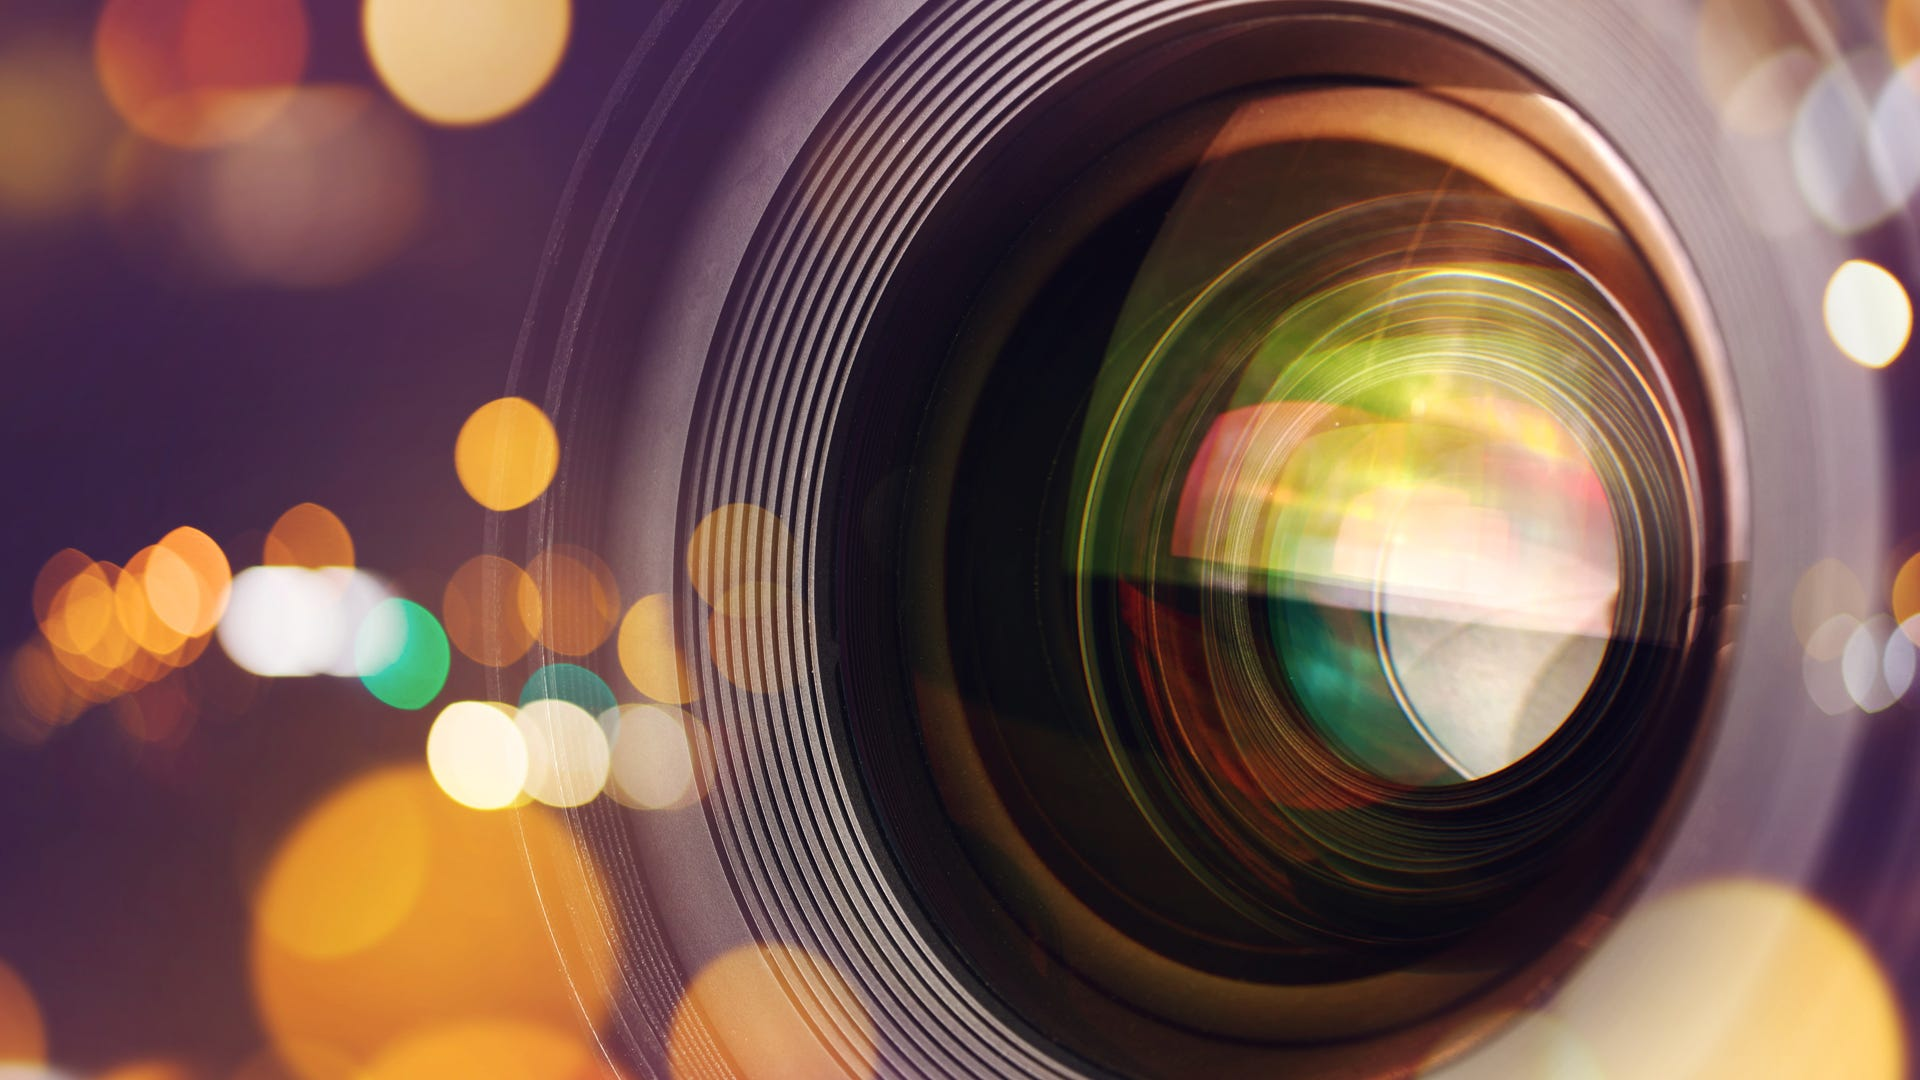 5 Best Camera Lenses for Bokeh Photography - ALC